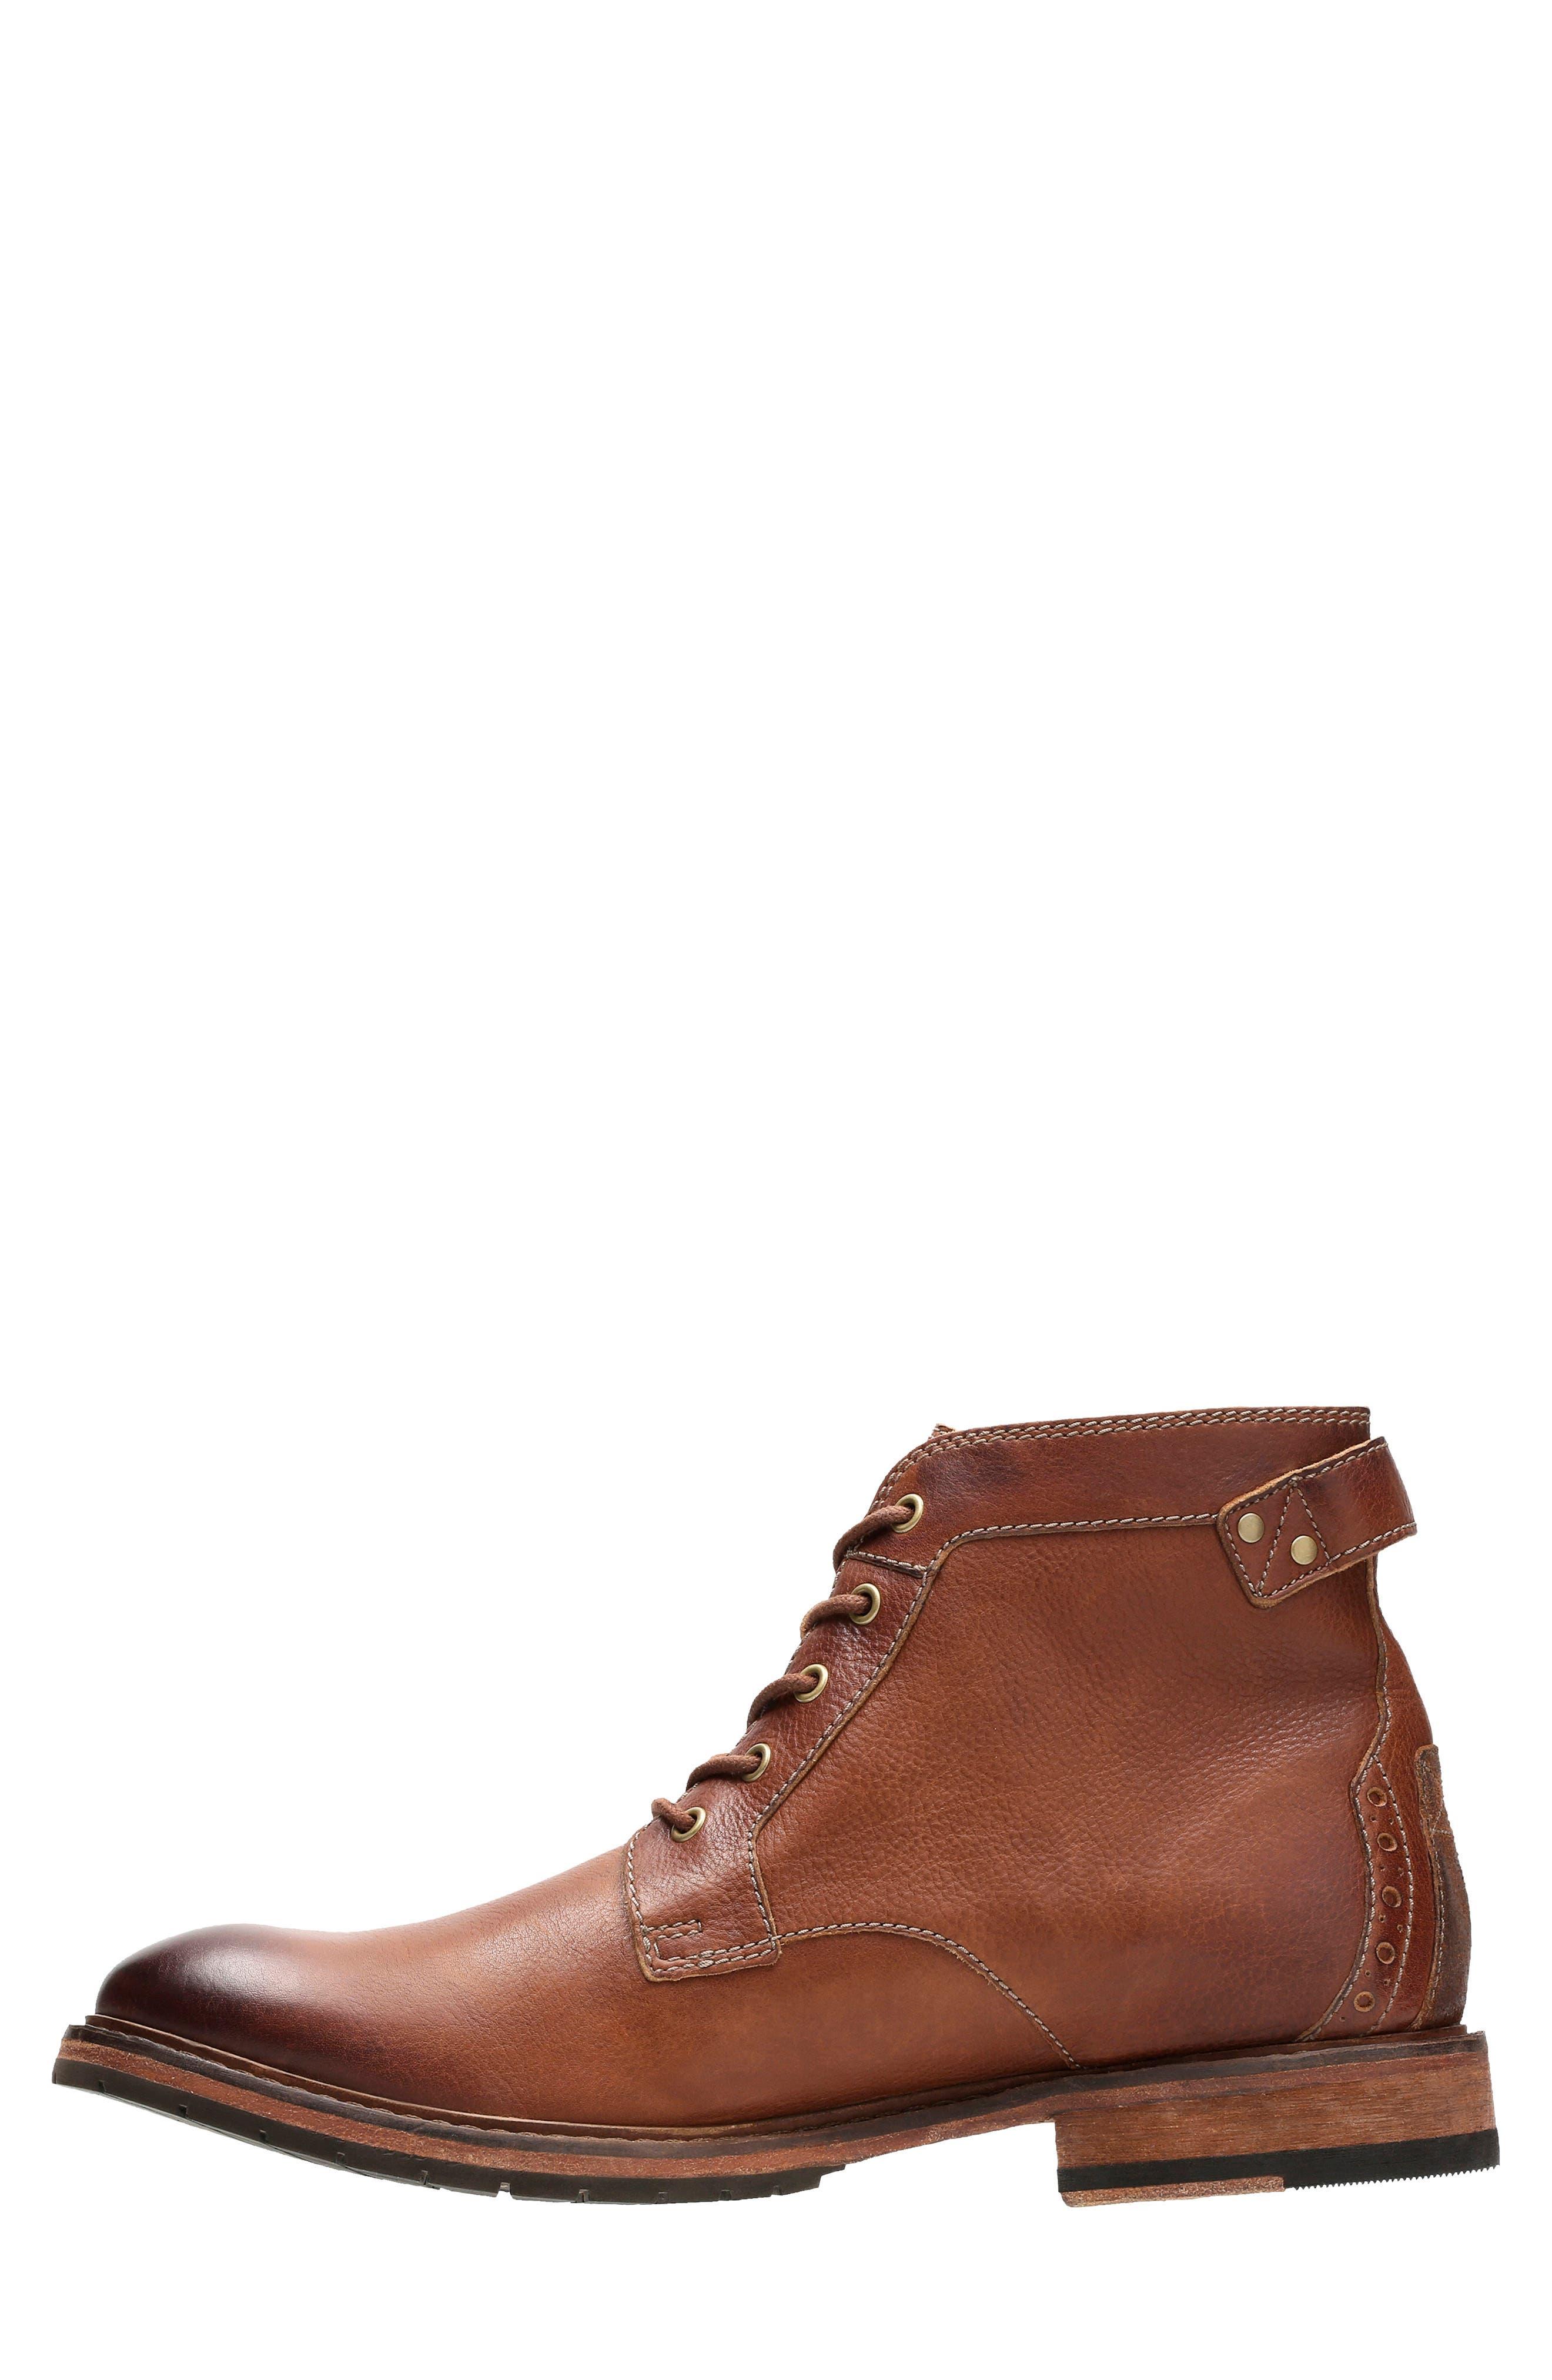 Clarkdale Bud Plain Toe Boot,                             Alternate thumbnail 6, color,                             DARK TAN LEATHER